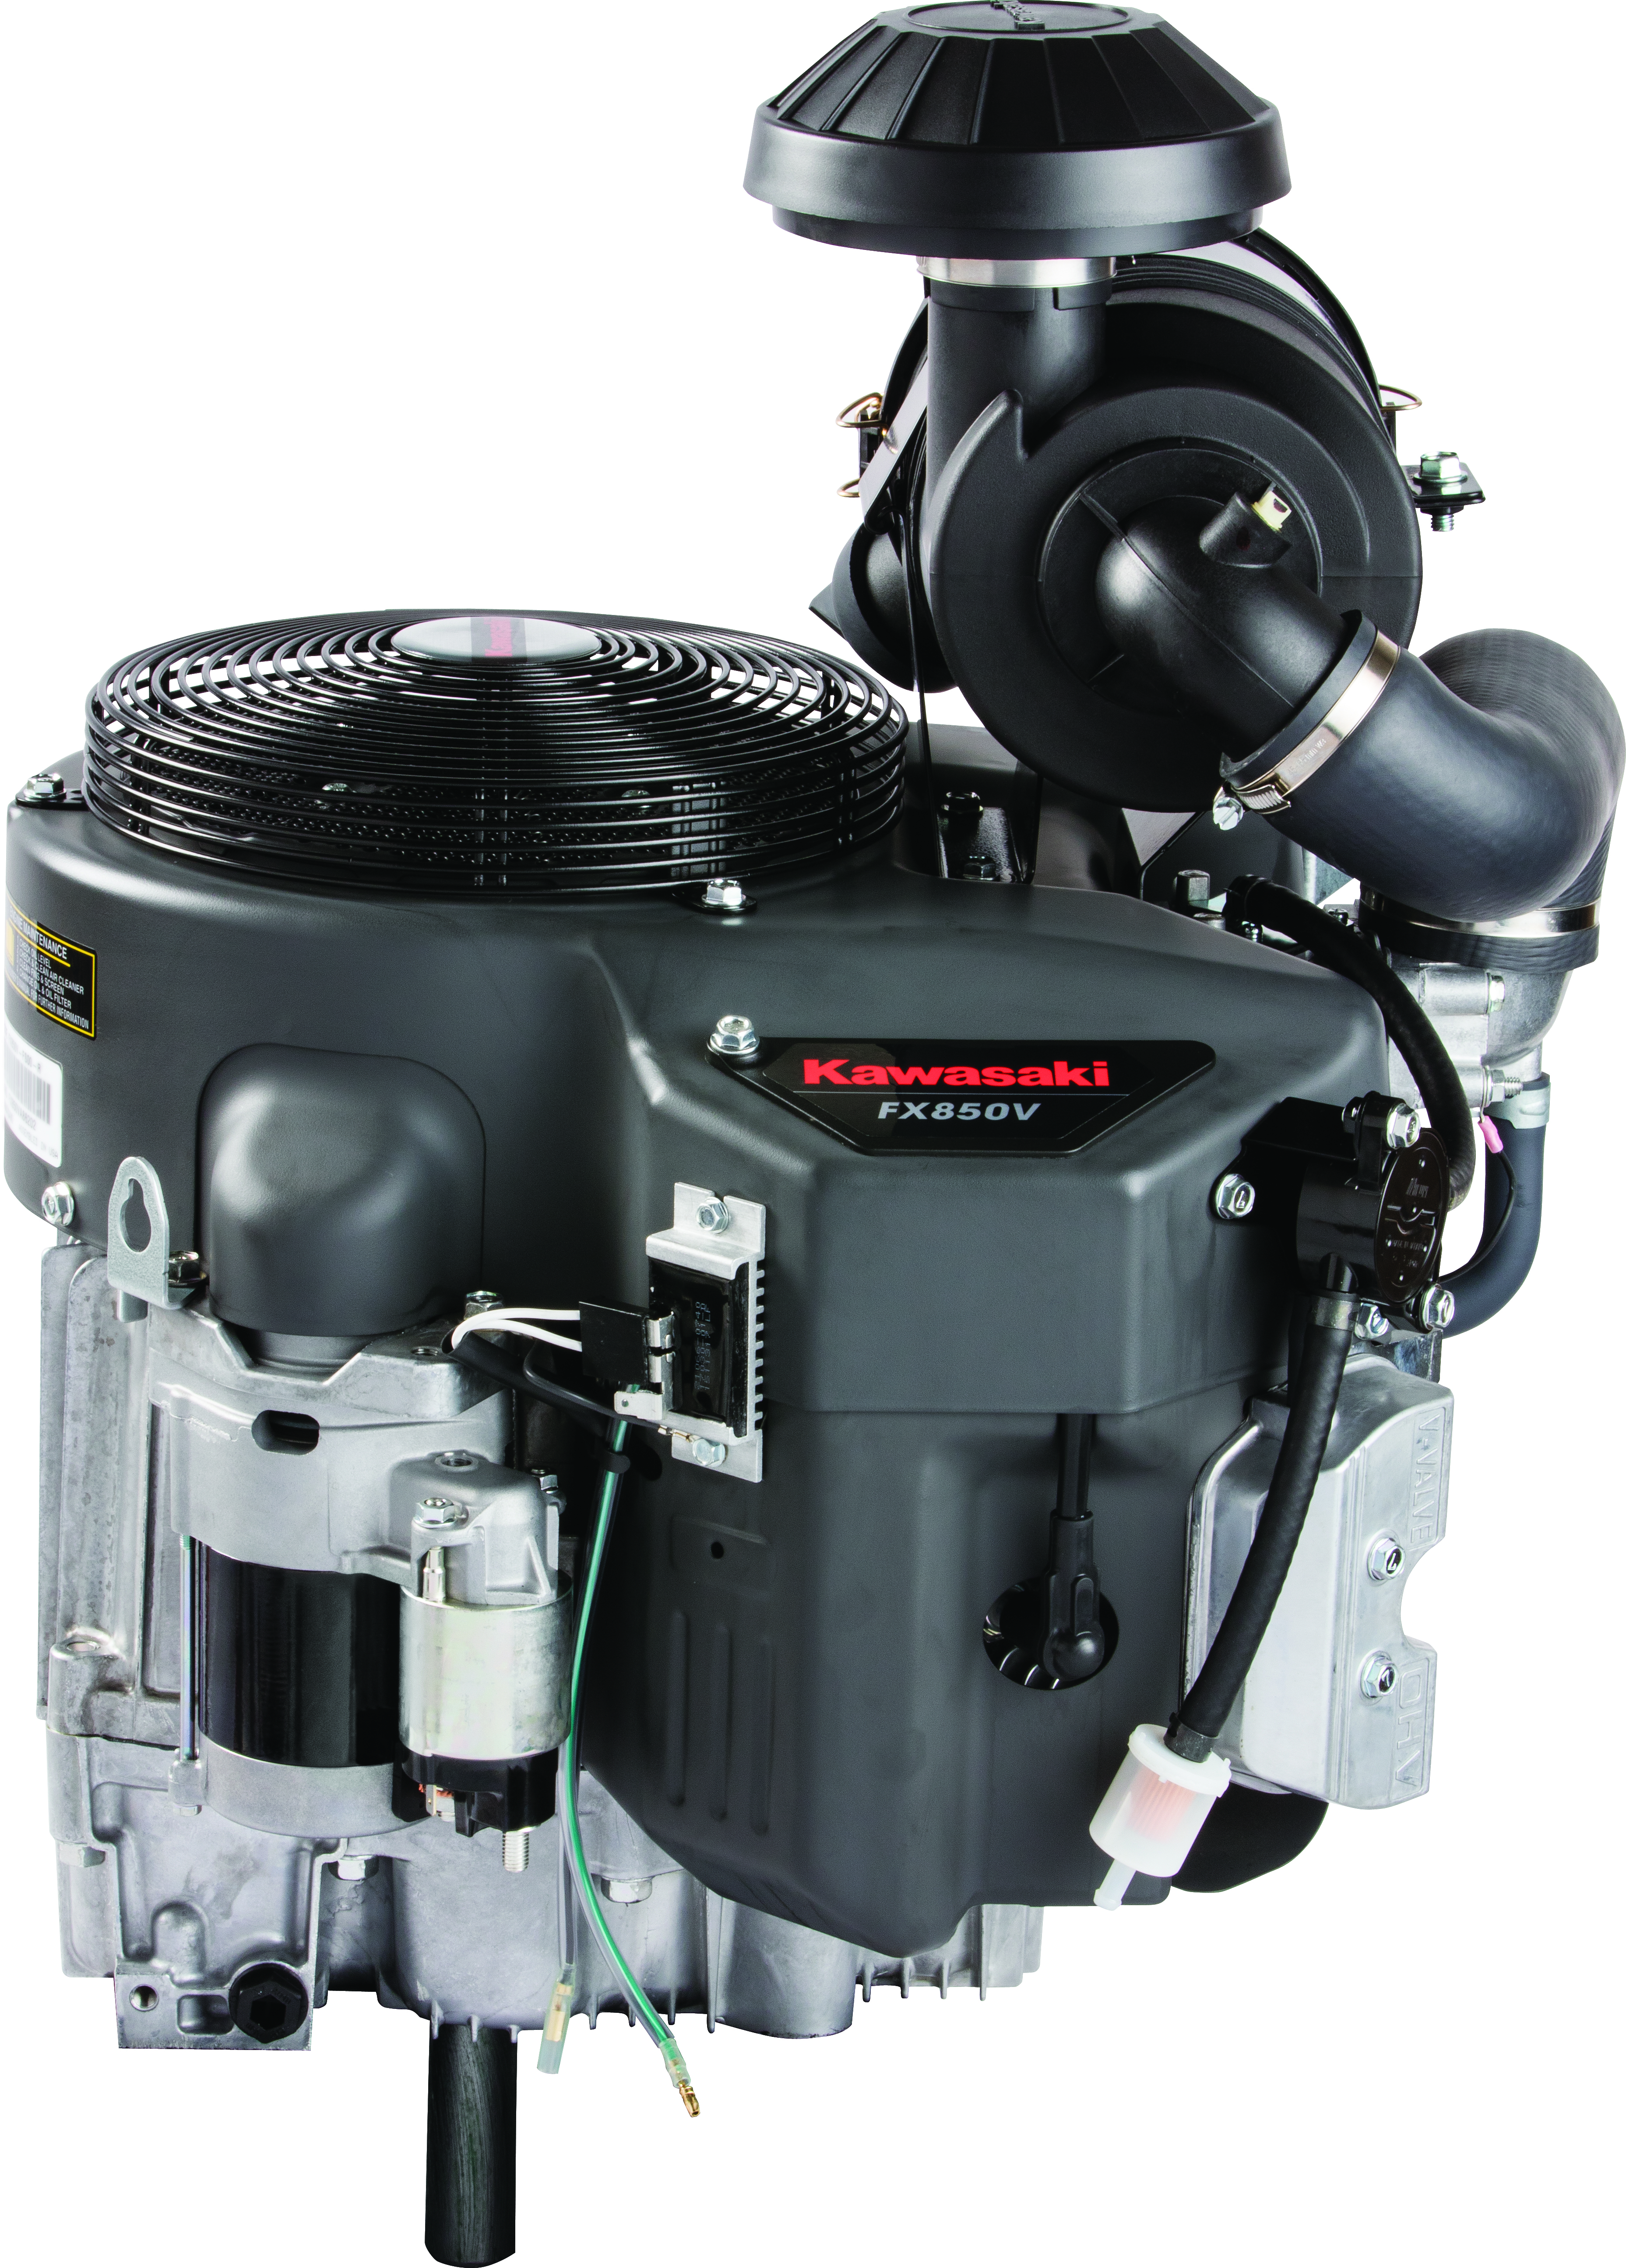 FX850V Kawasaki Engine